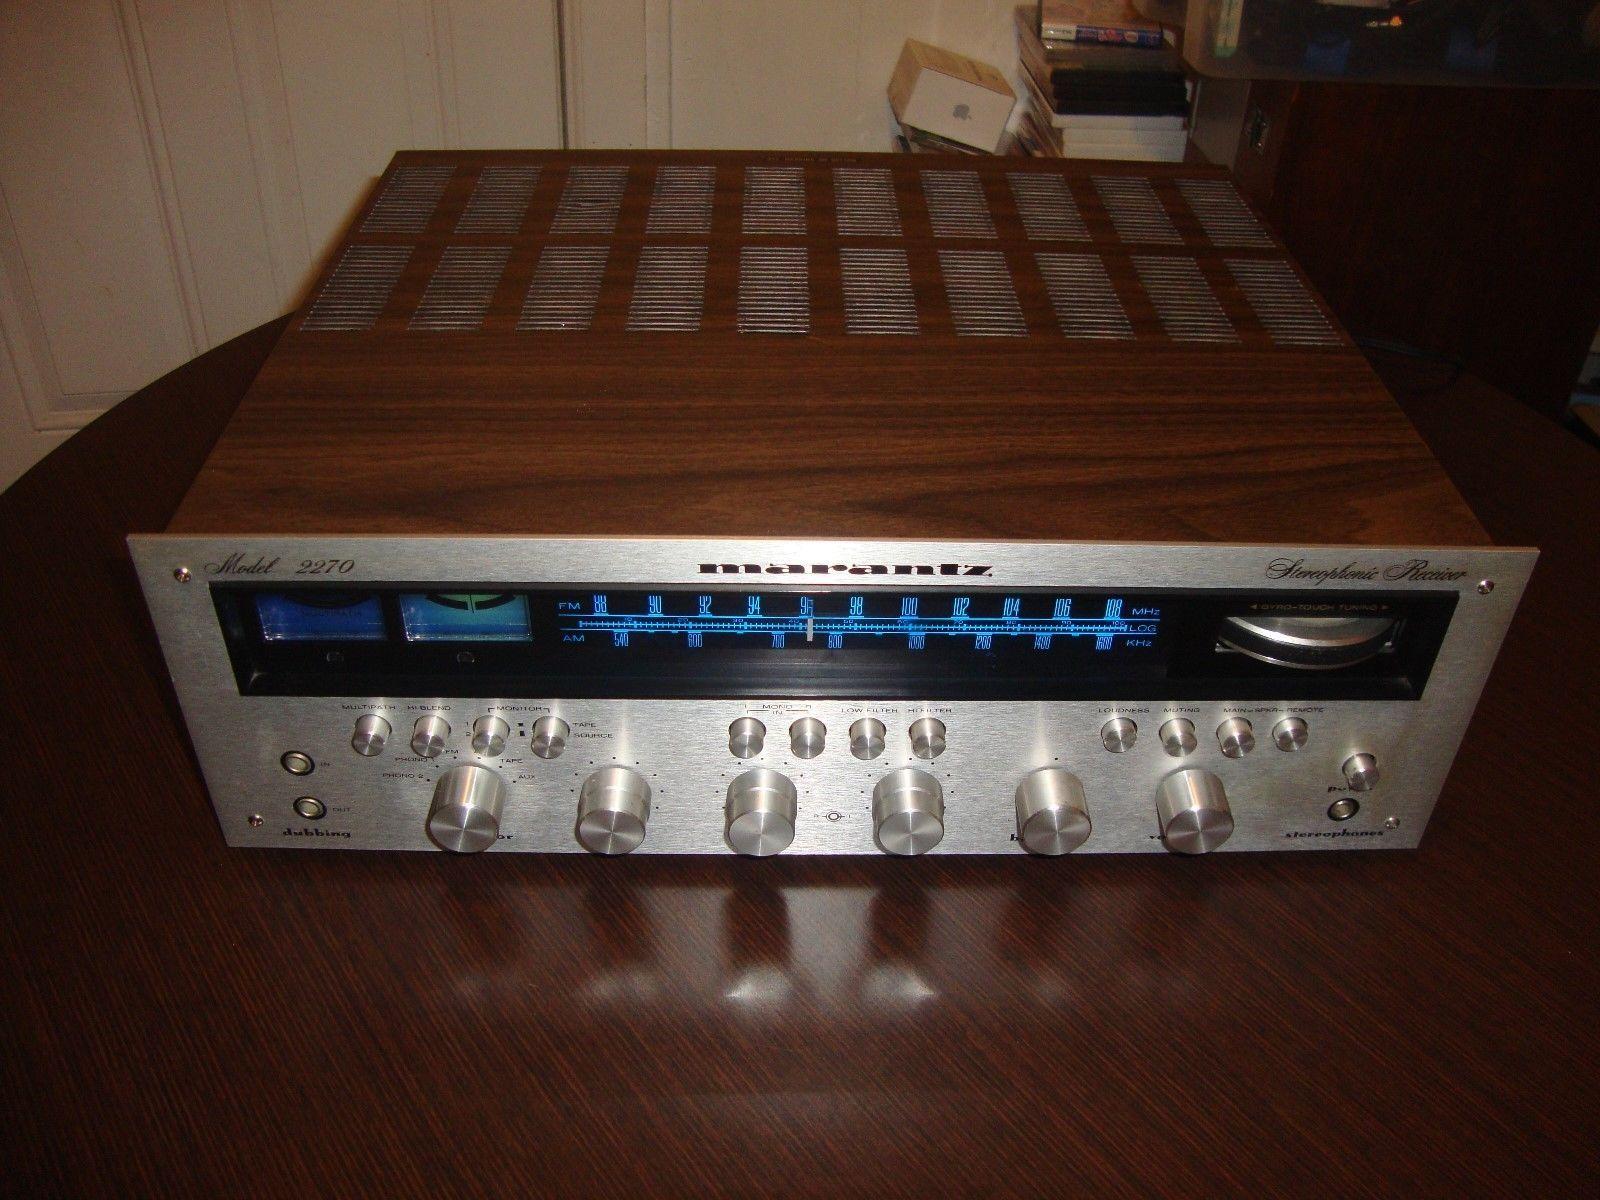 Vintage Marantz Model 2270 FM/AM Stereophonic Receiver   eBay